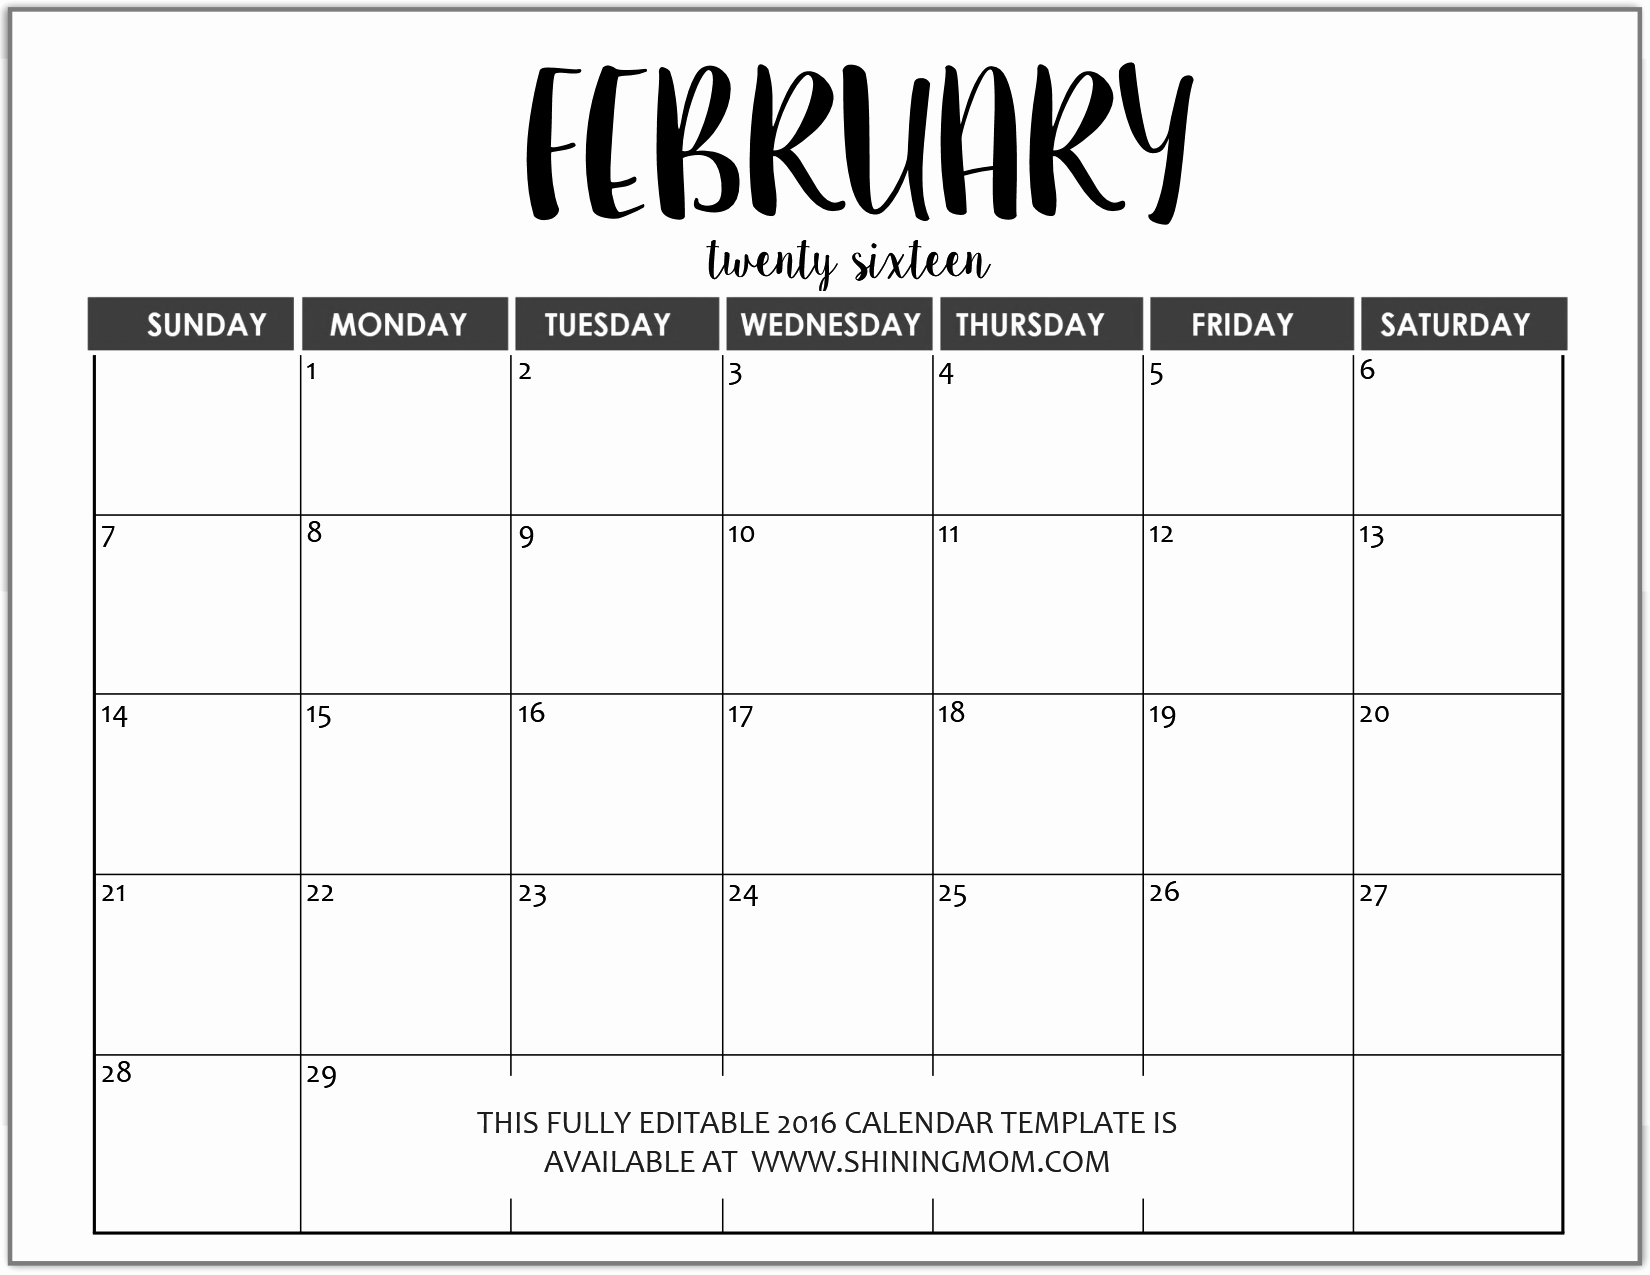 Microsoft Calendar Templates 2019 Luxury Just In Fully Editable 2016 Calendar Templates In Ms Word